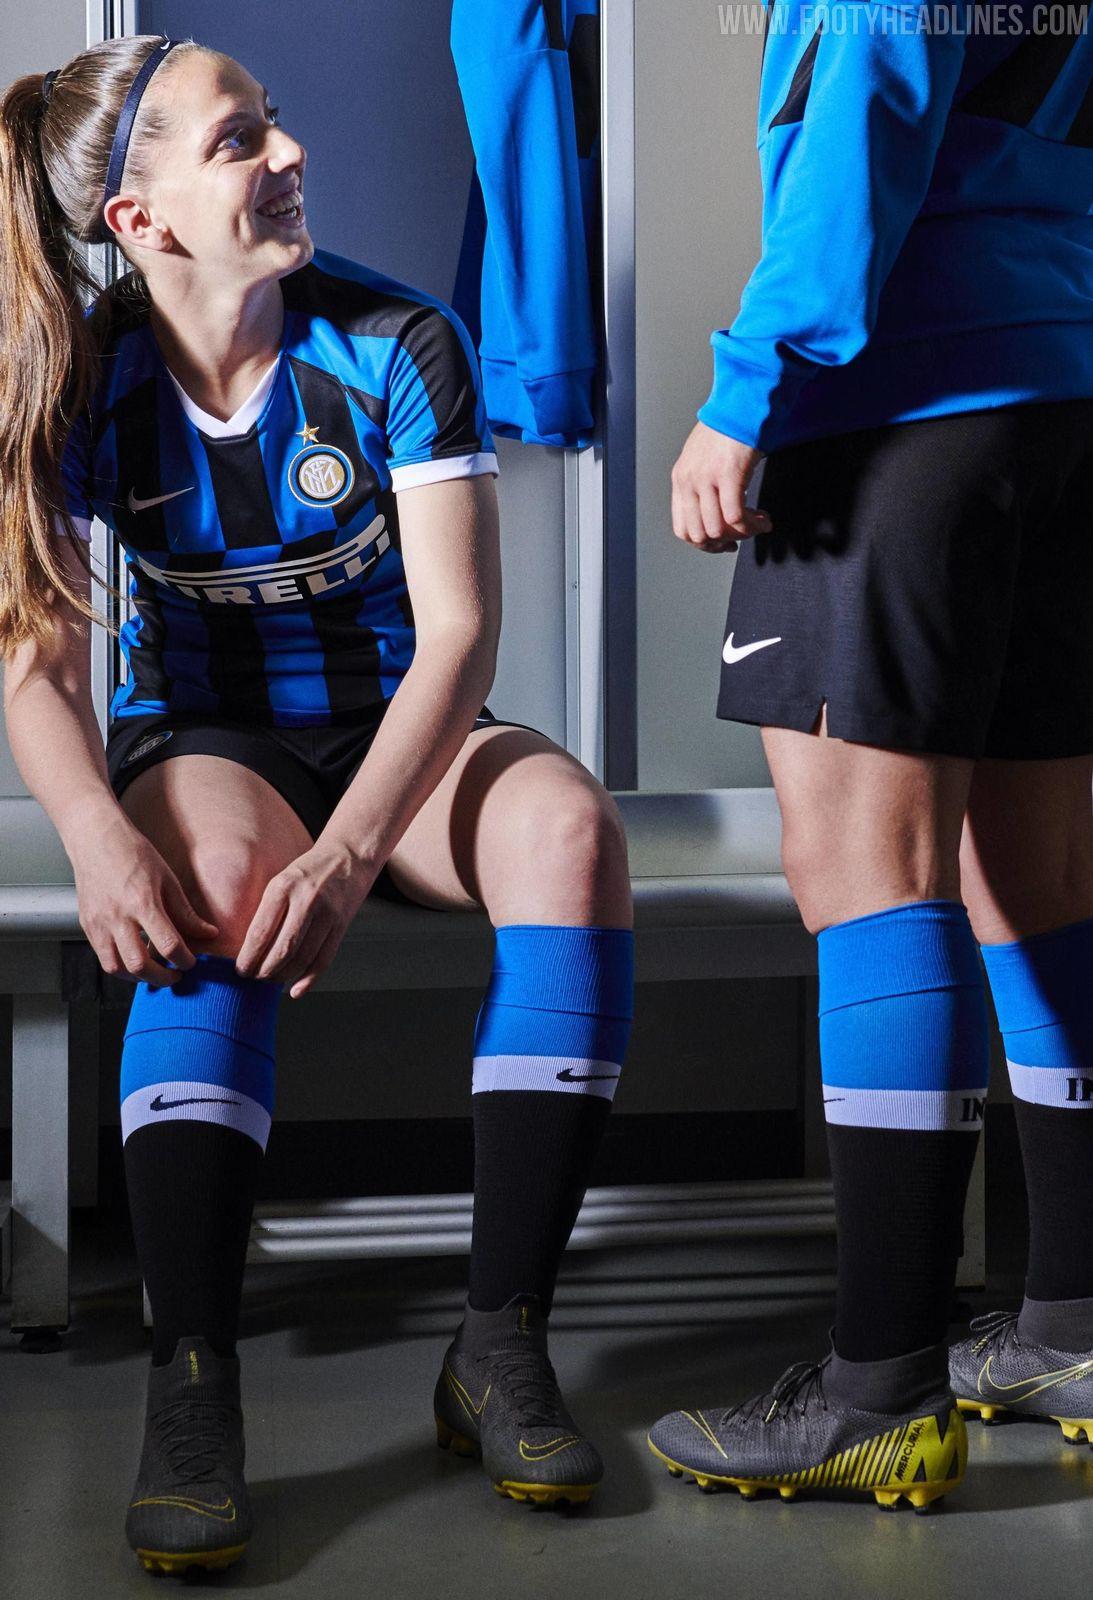 Wallpapers HD Inter Milan | 2020 Football Wallpaper  |Inter Milan